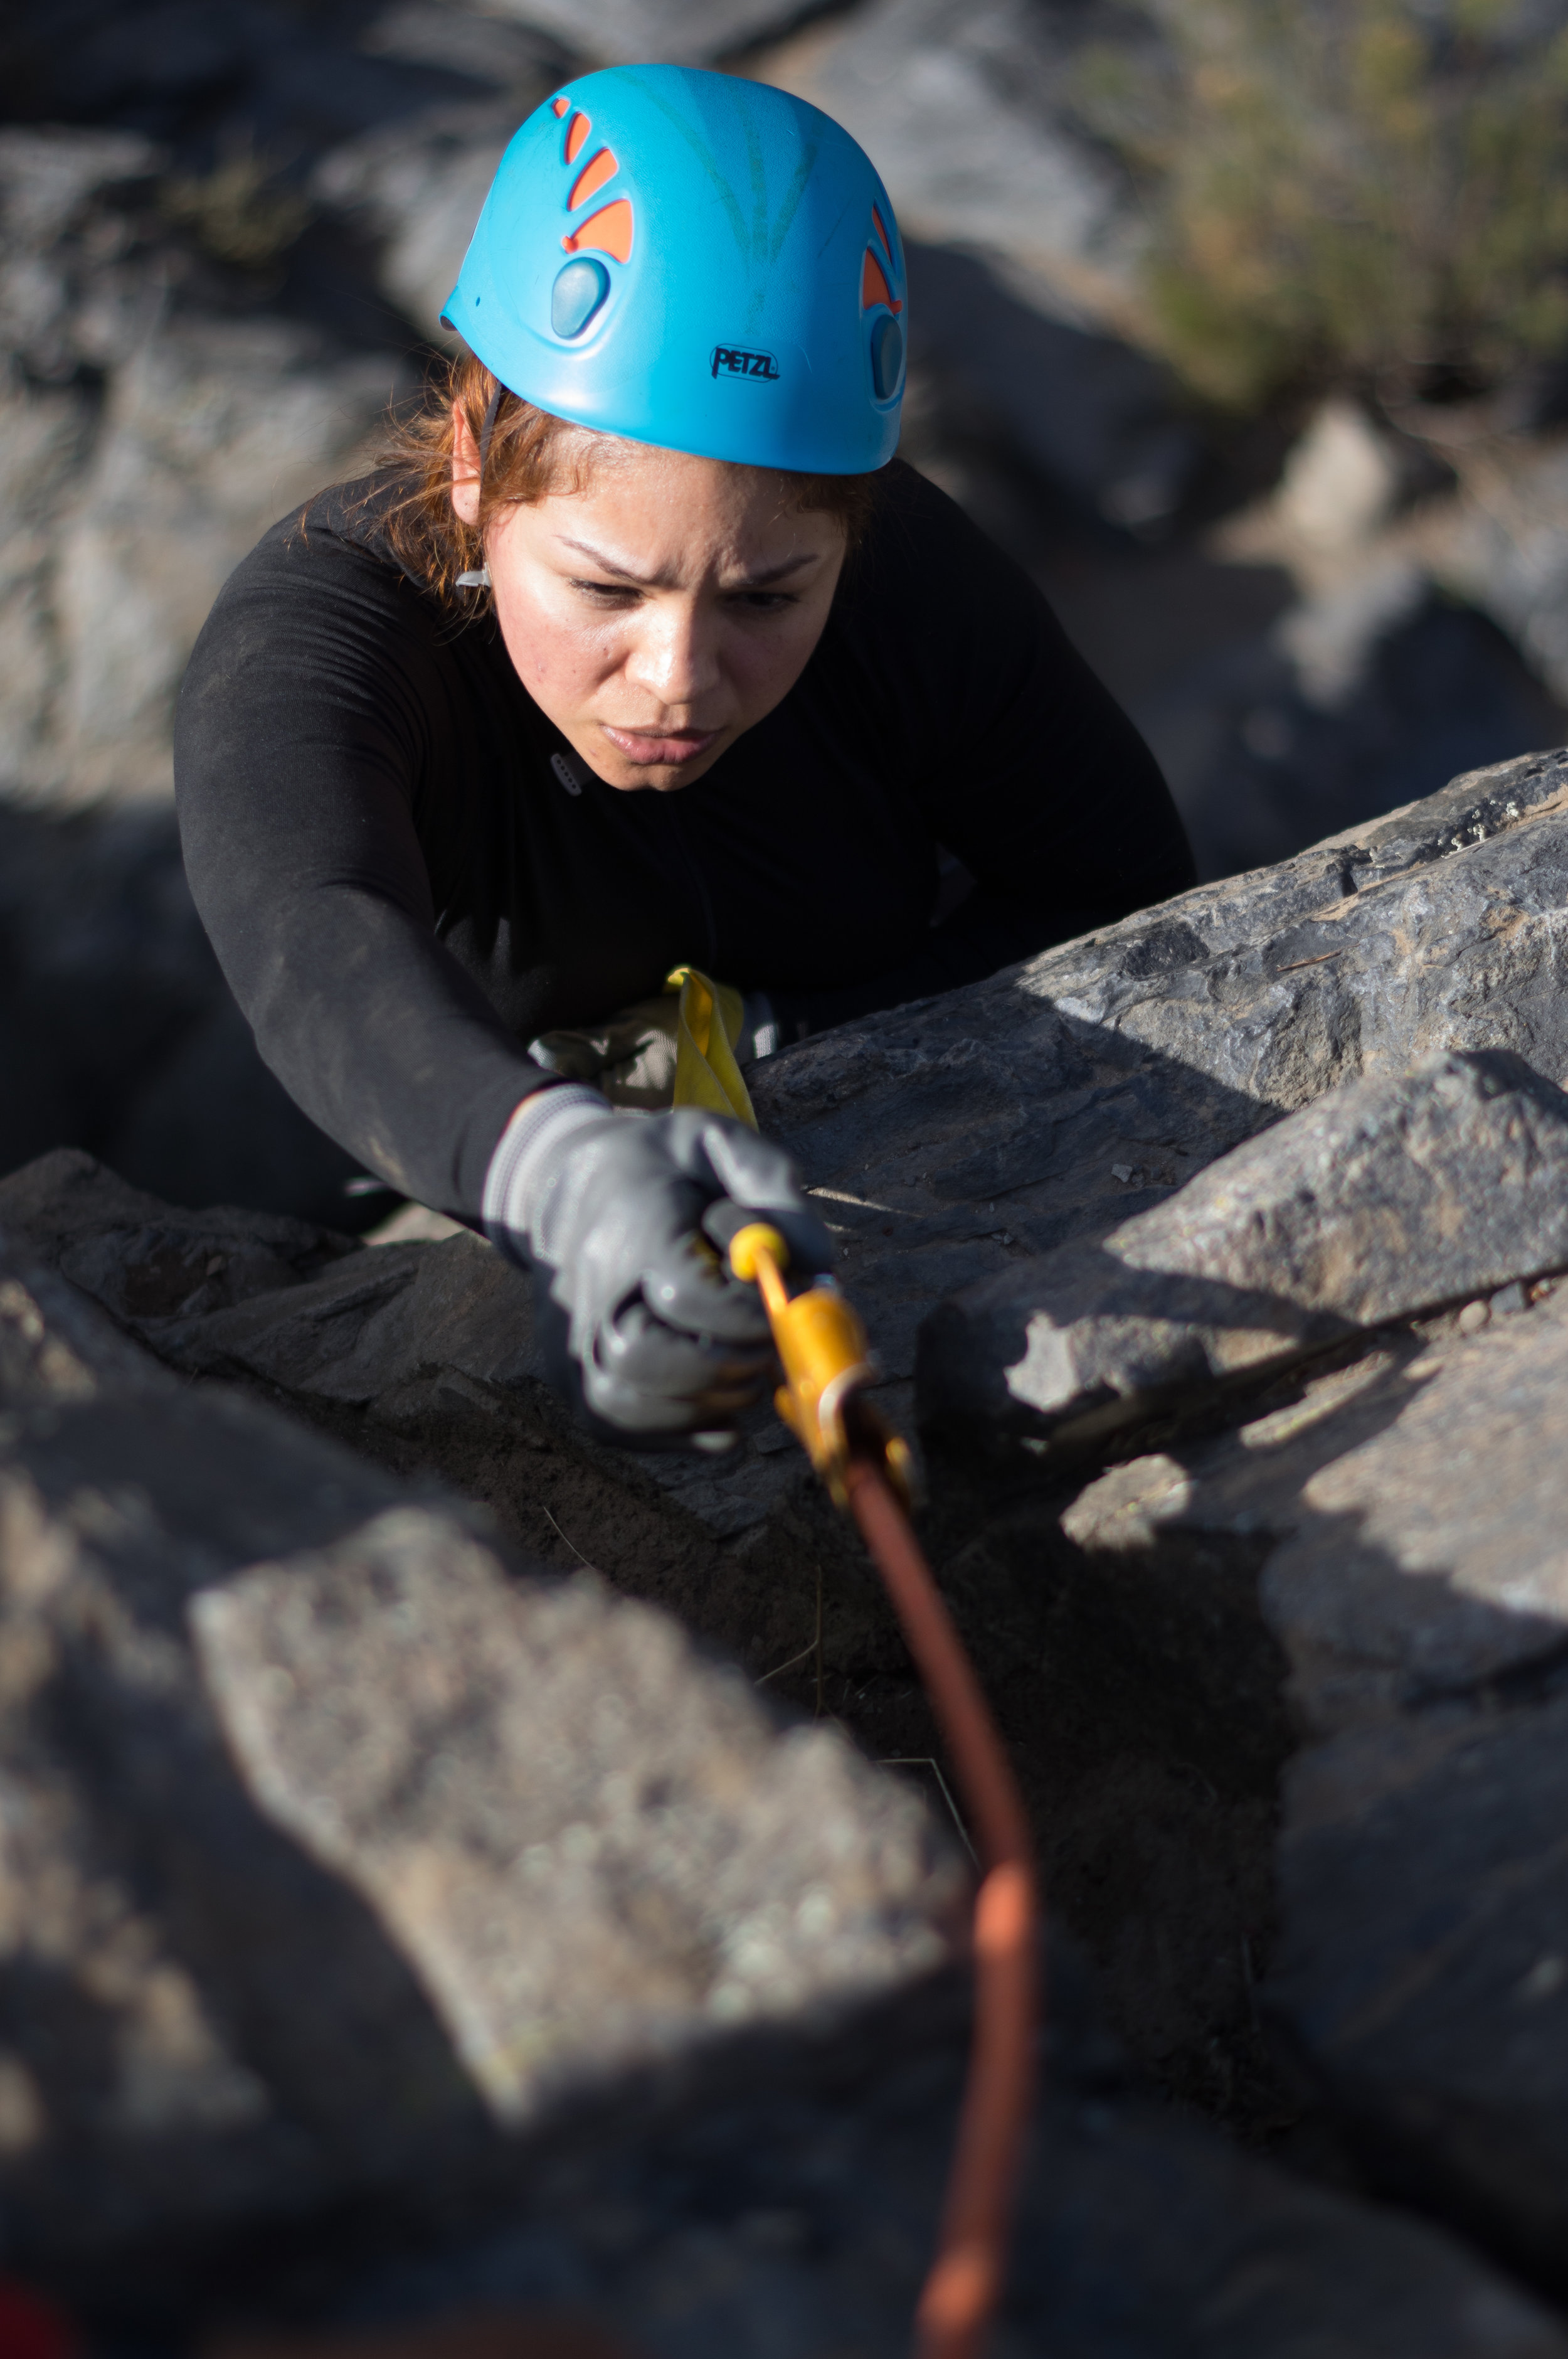 """I'm feeling way more comfortable"", Sinai exhales as she jumars up the last few feet of rope."